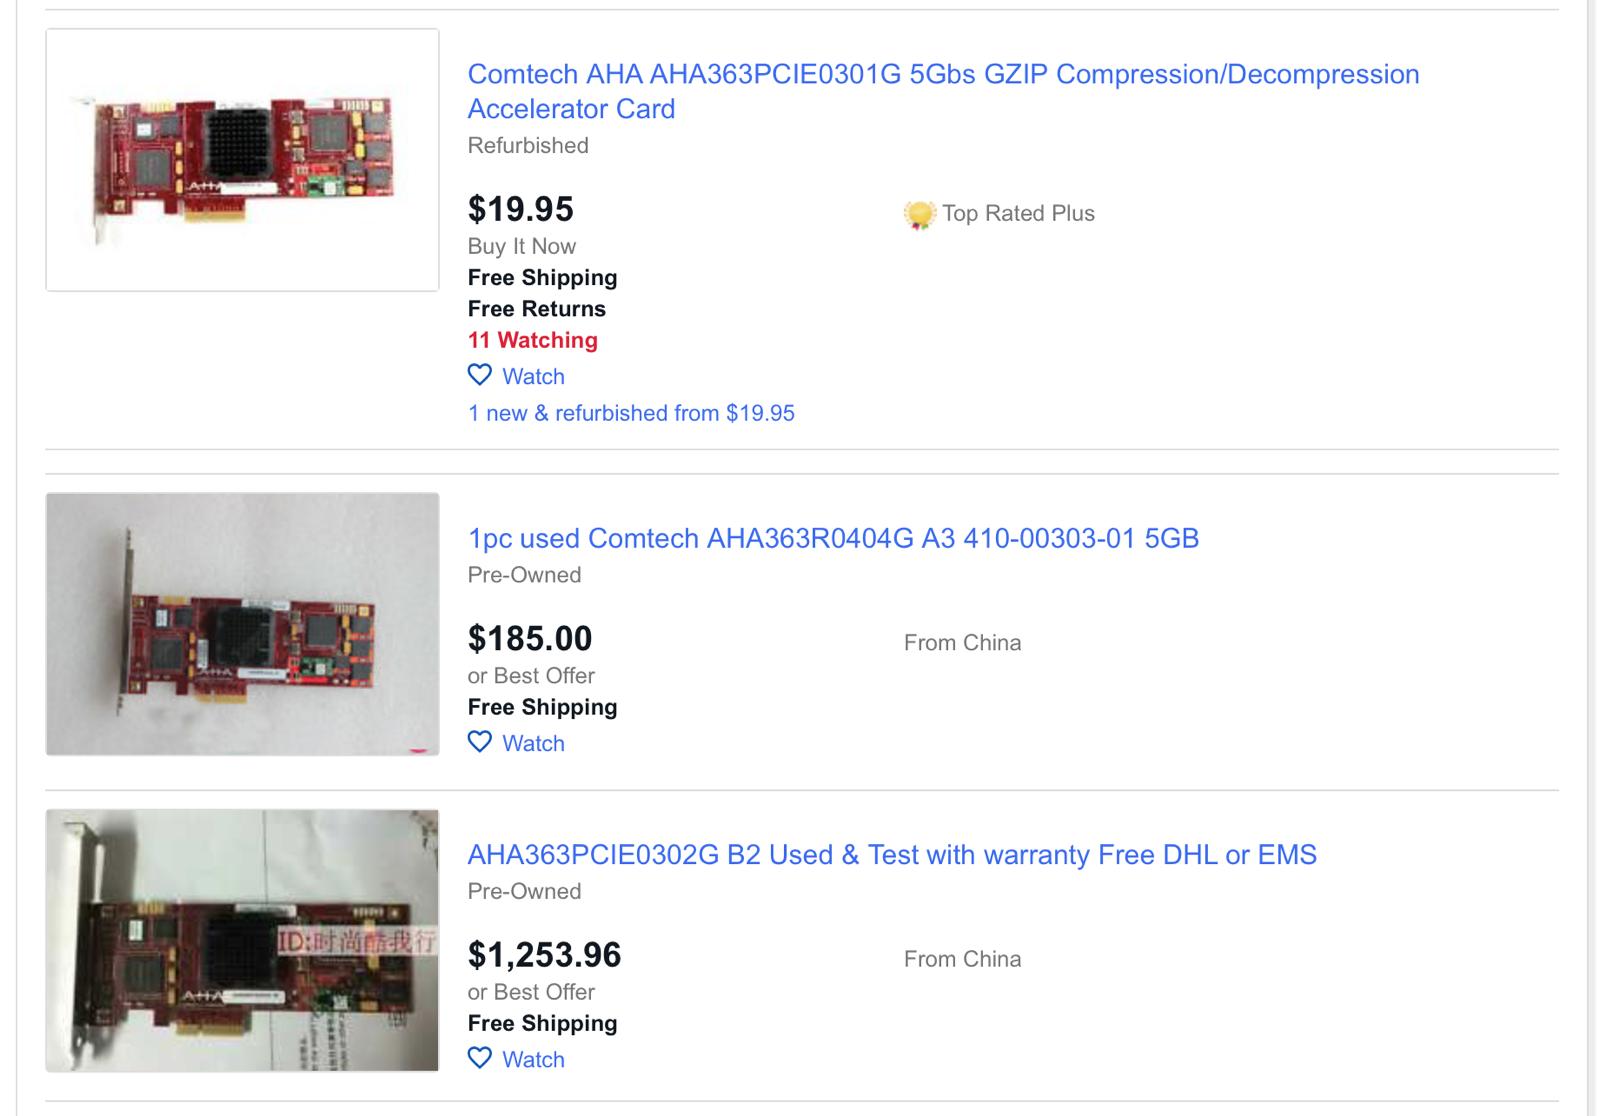 AHA363 on eBay